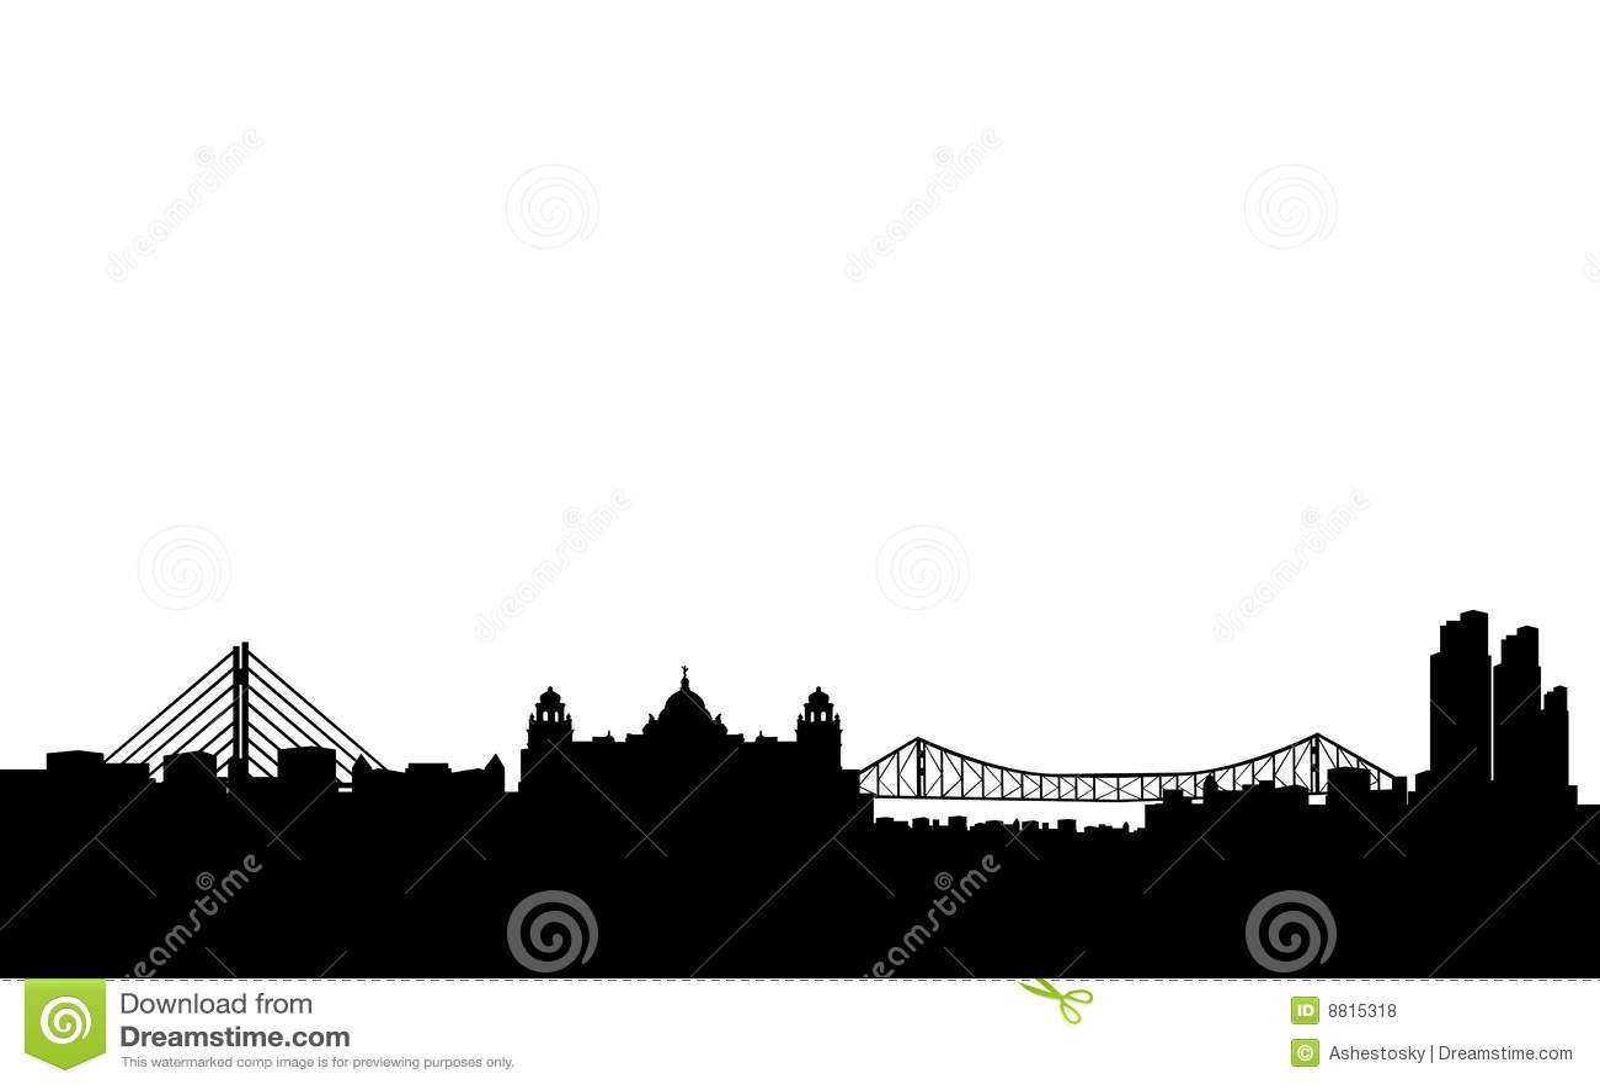 city silhouette clip art